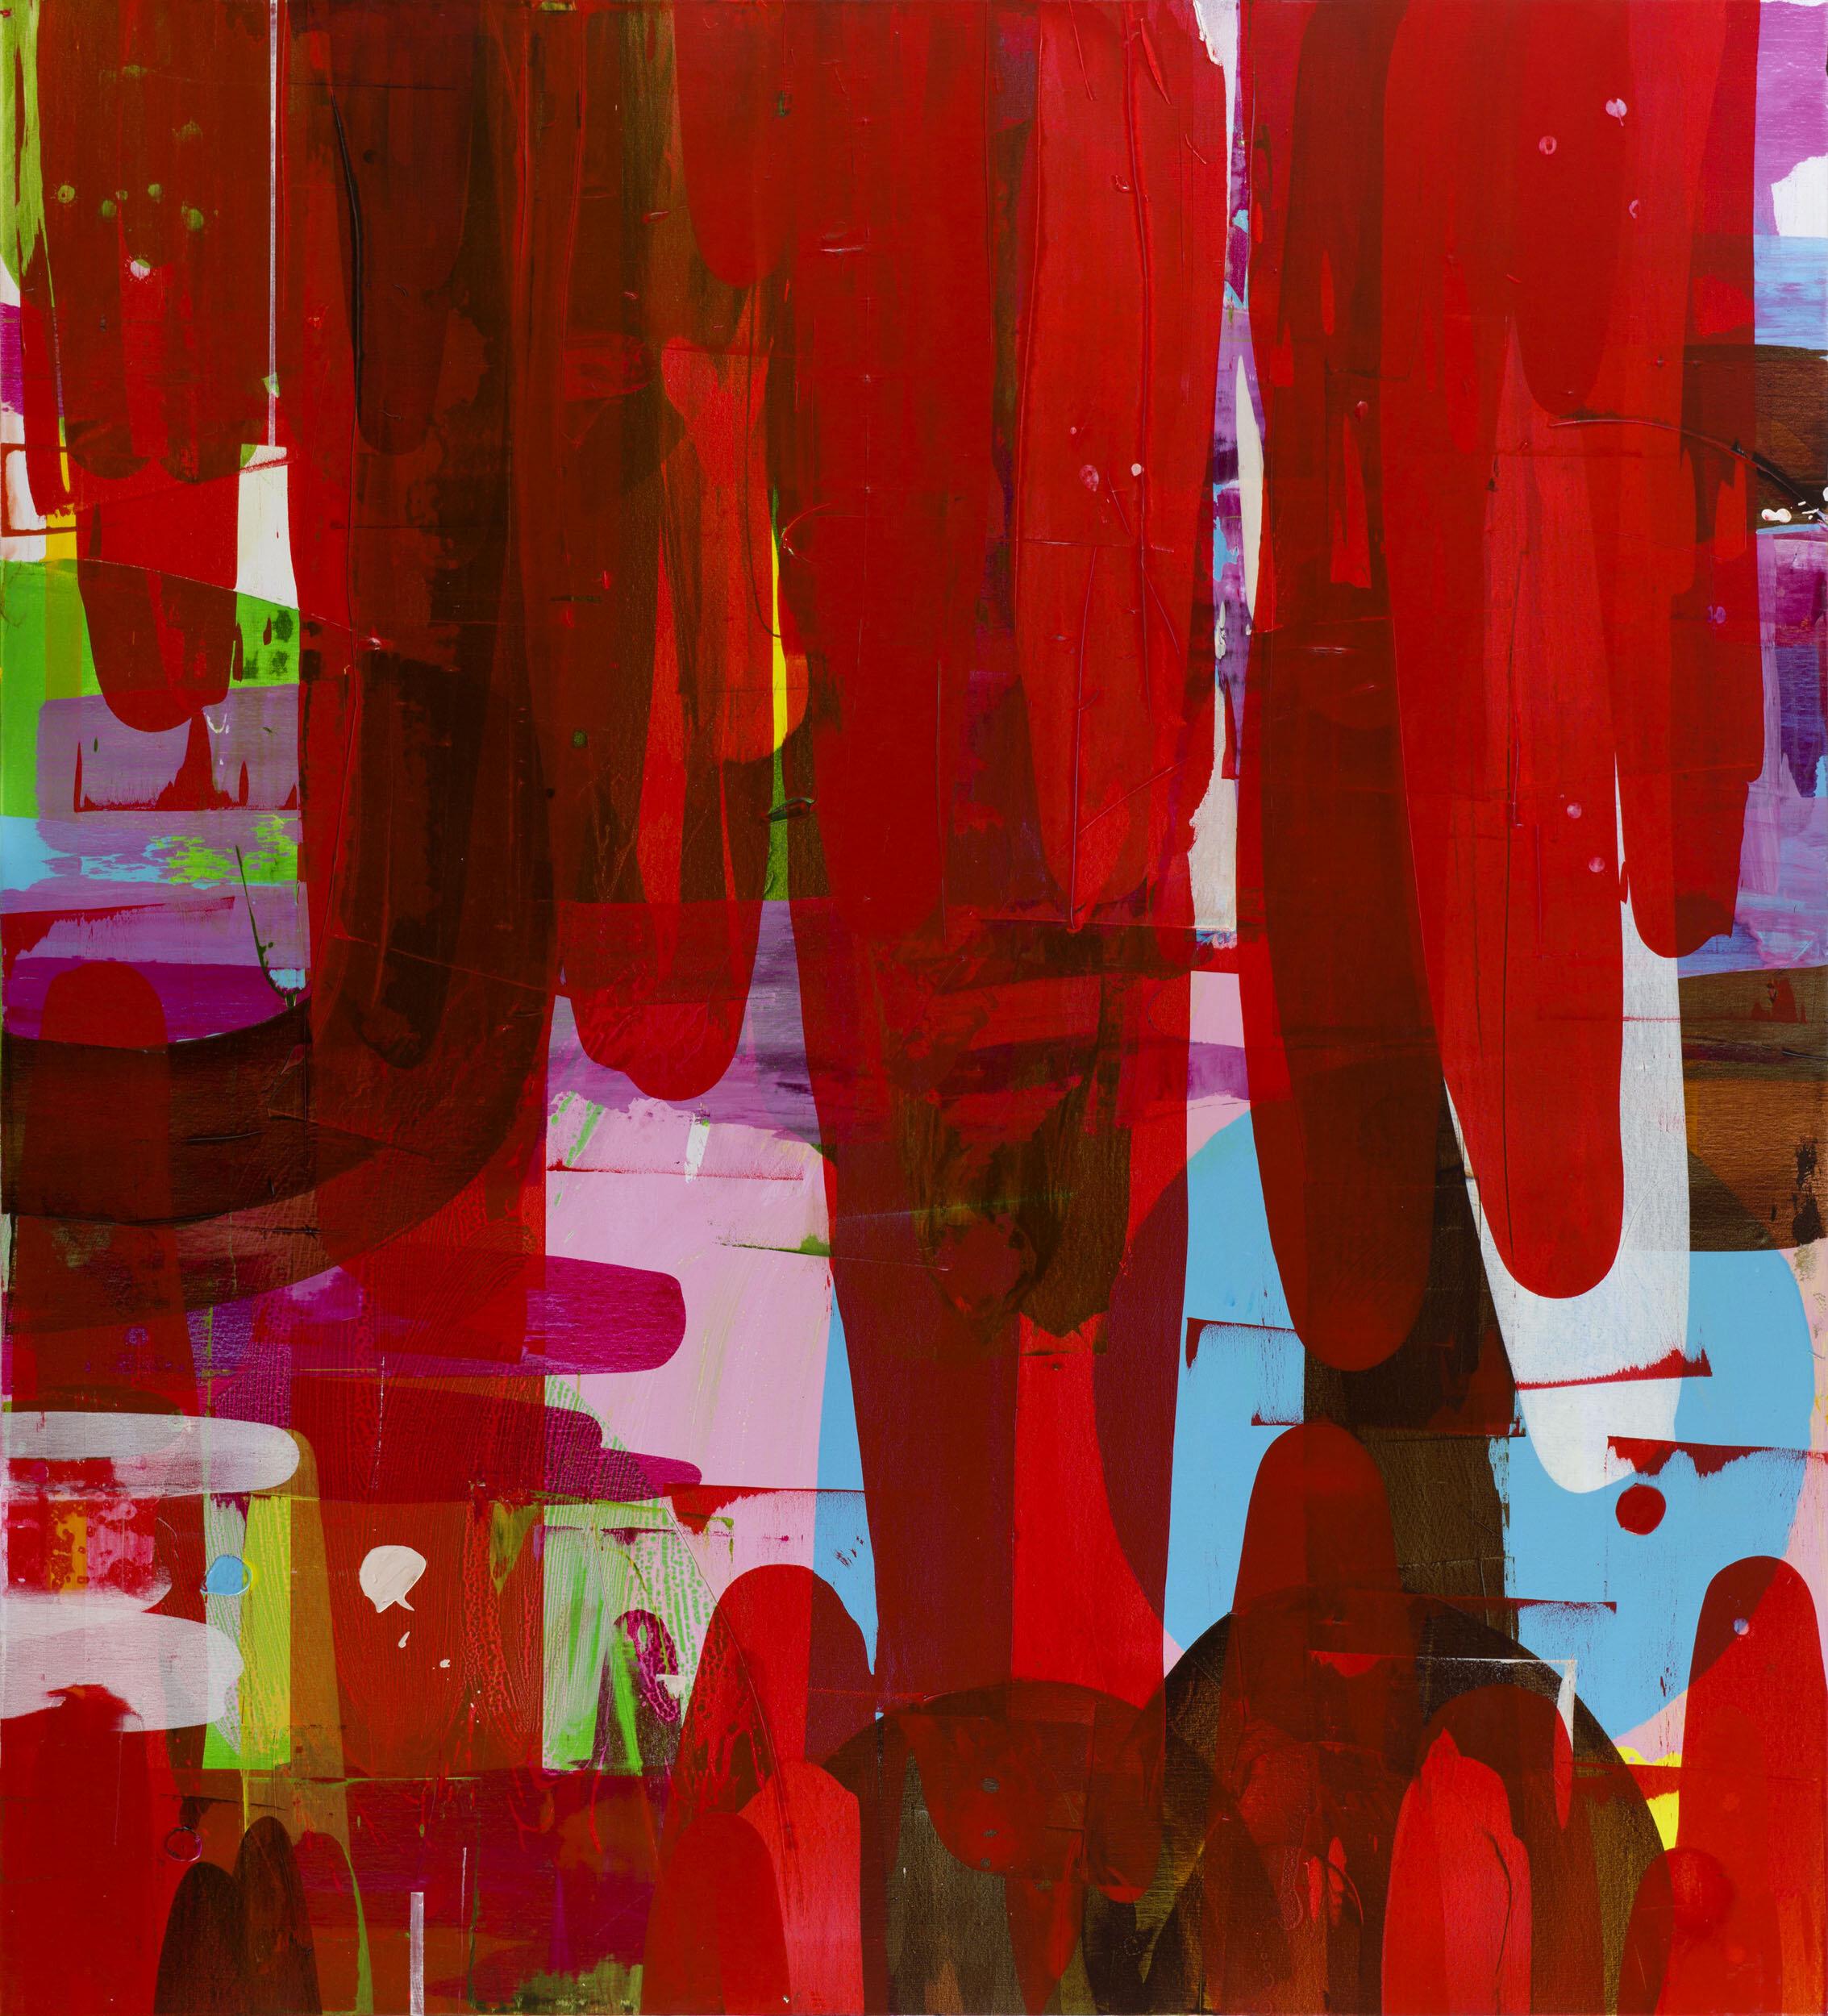 Astrid Sylwan   Love and all its glory  2010 Signerad och daterad a tergo  Akryl på duk 220 x 200 cm